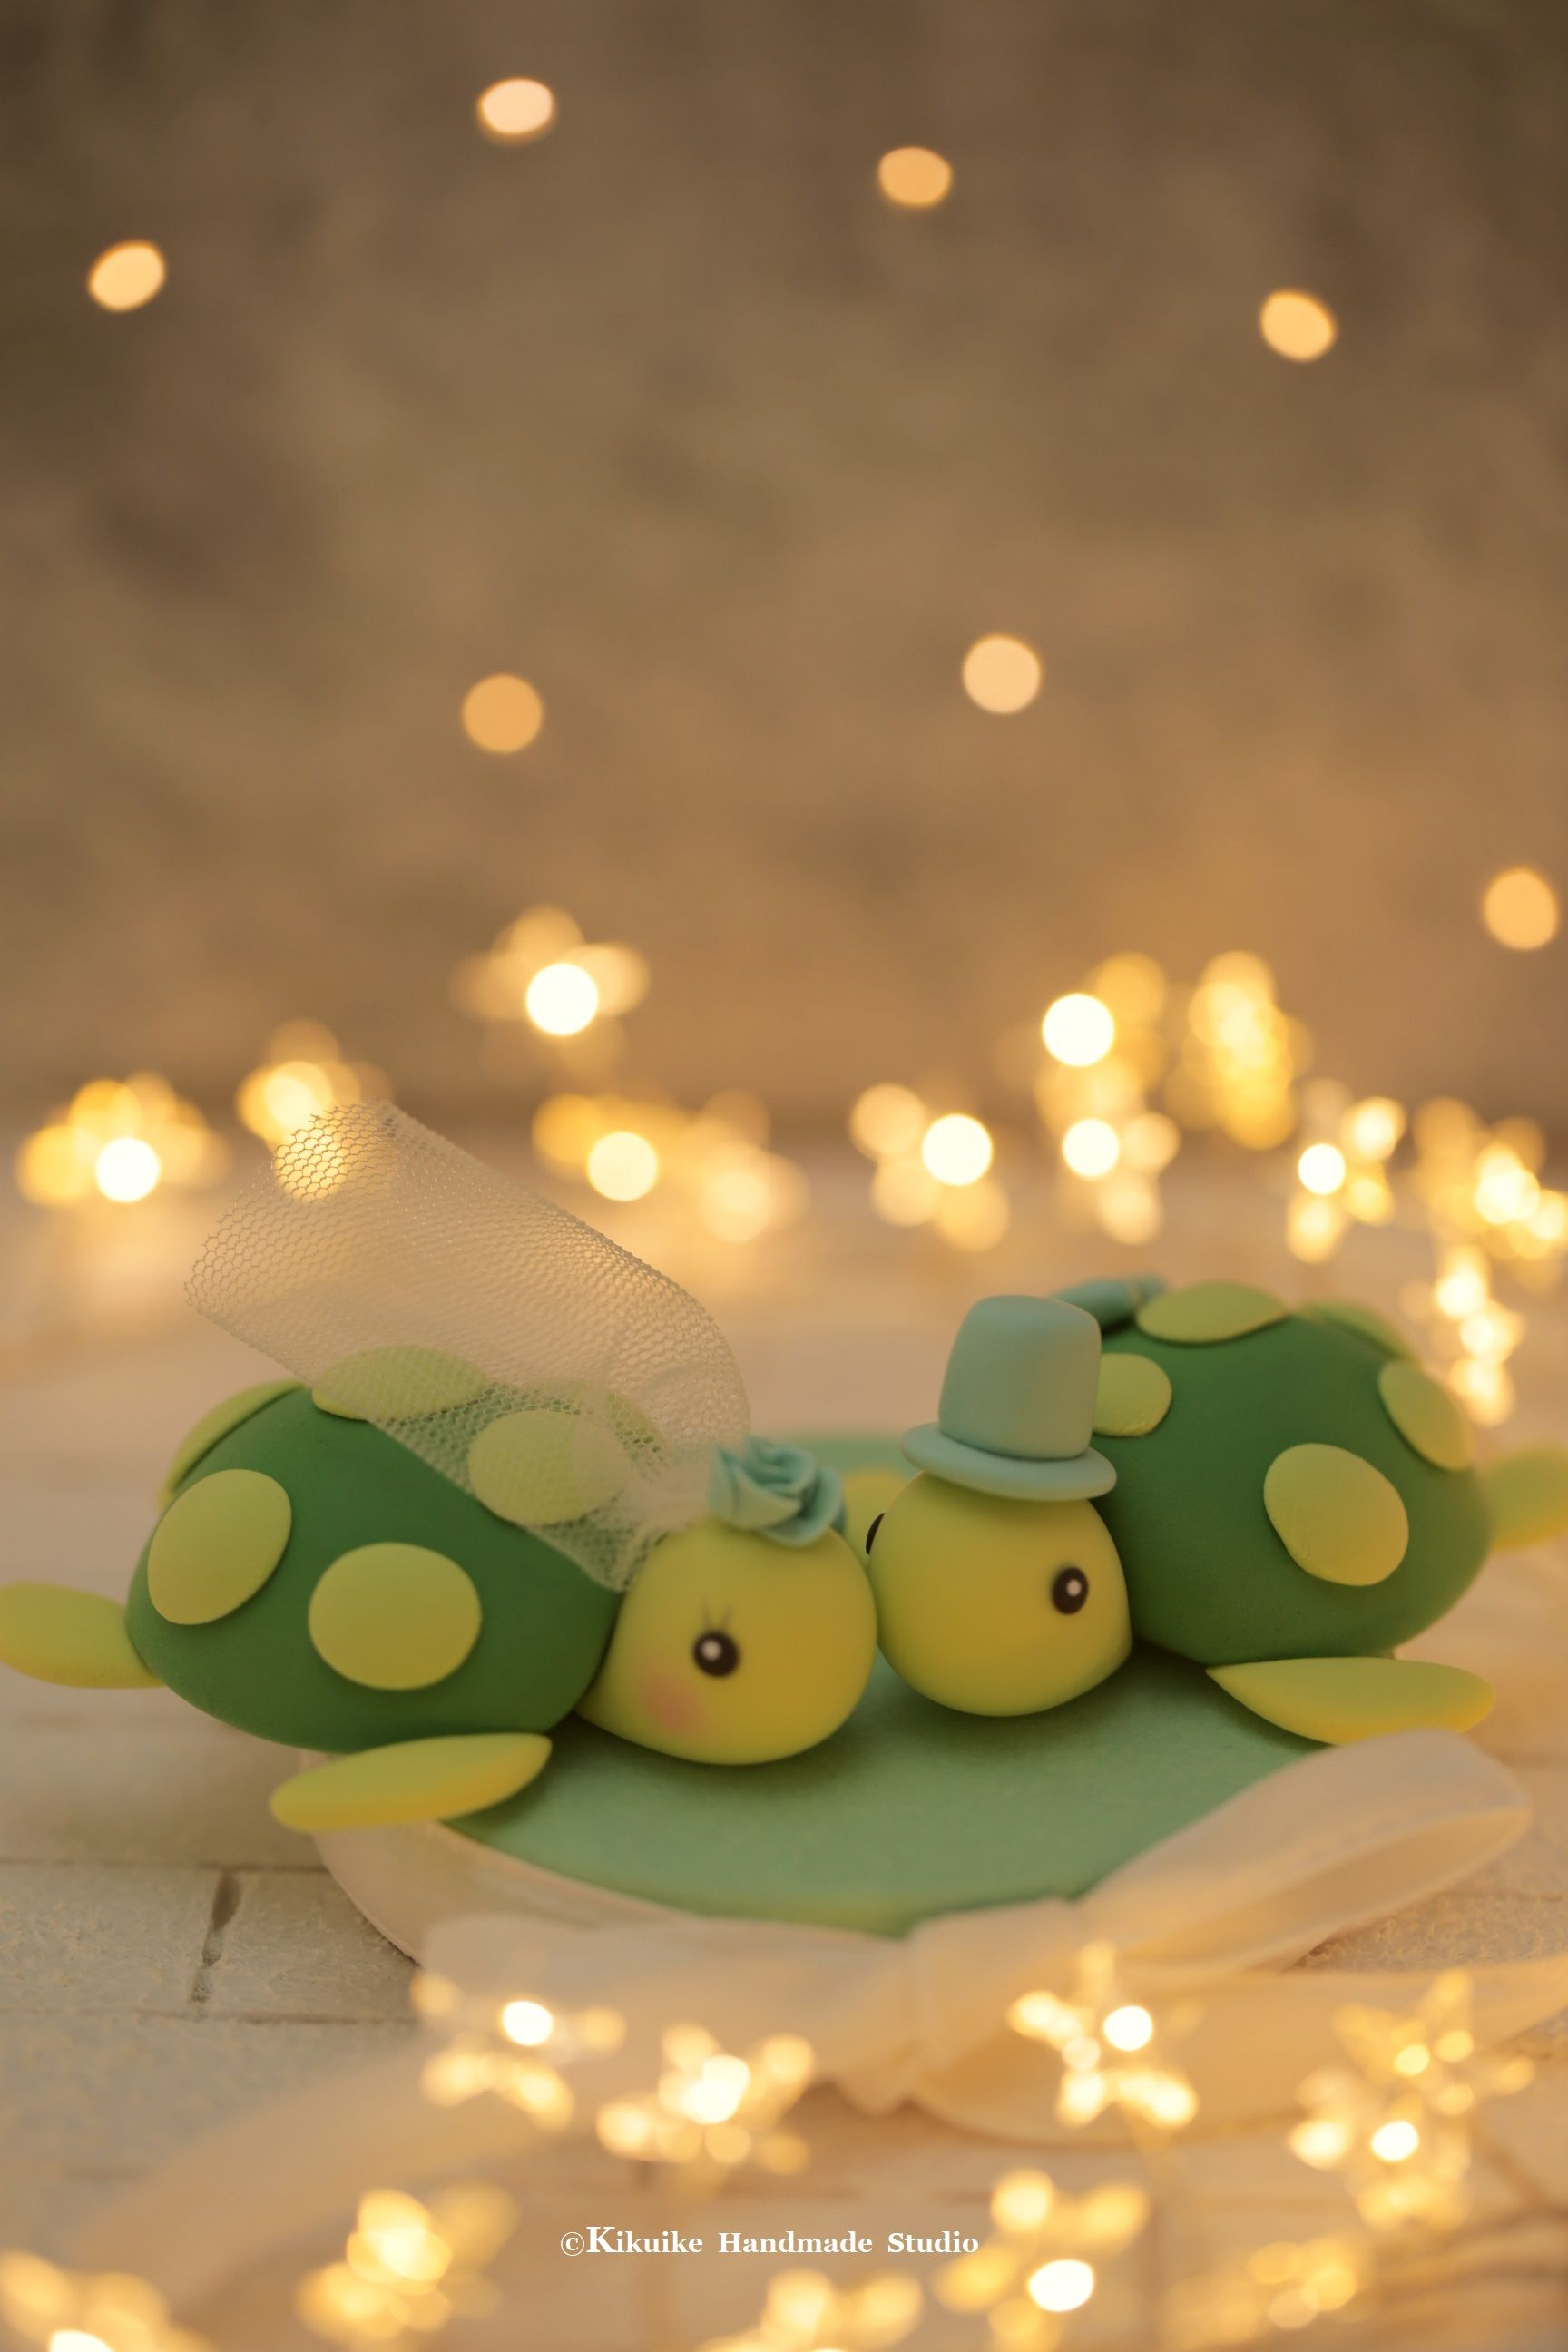 Turtles wedding cake topper for pair ehhh tenemos boda